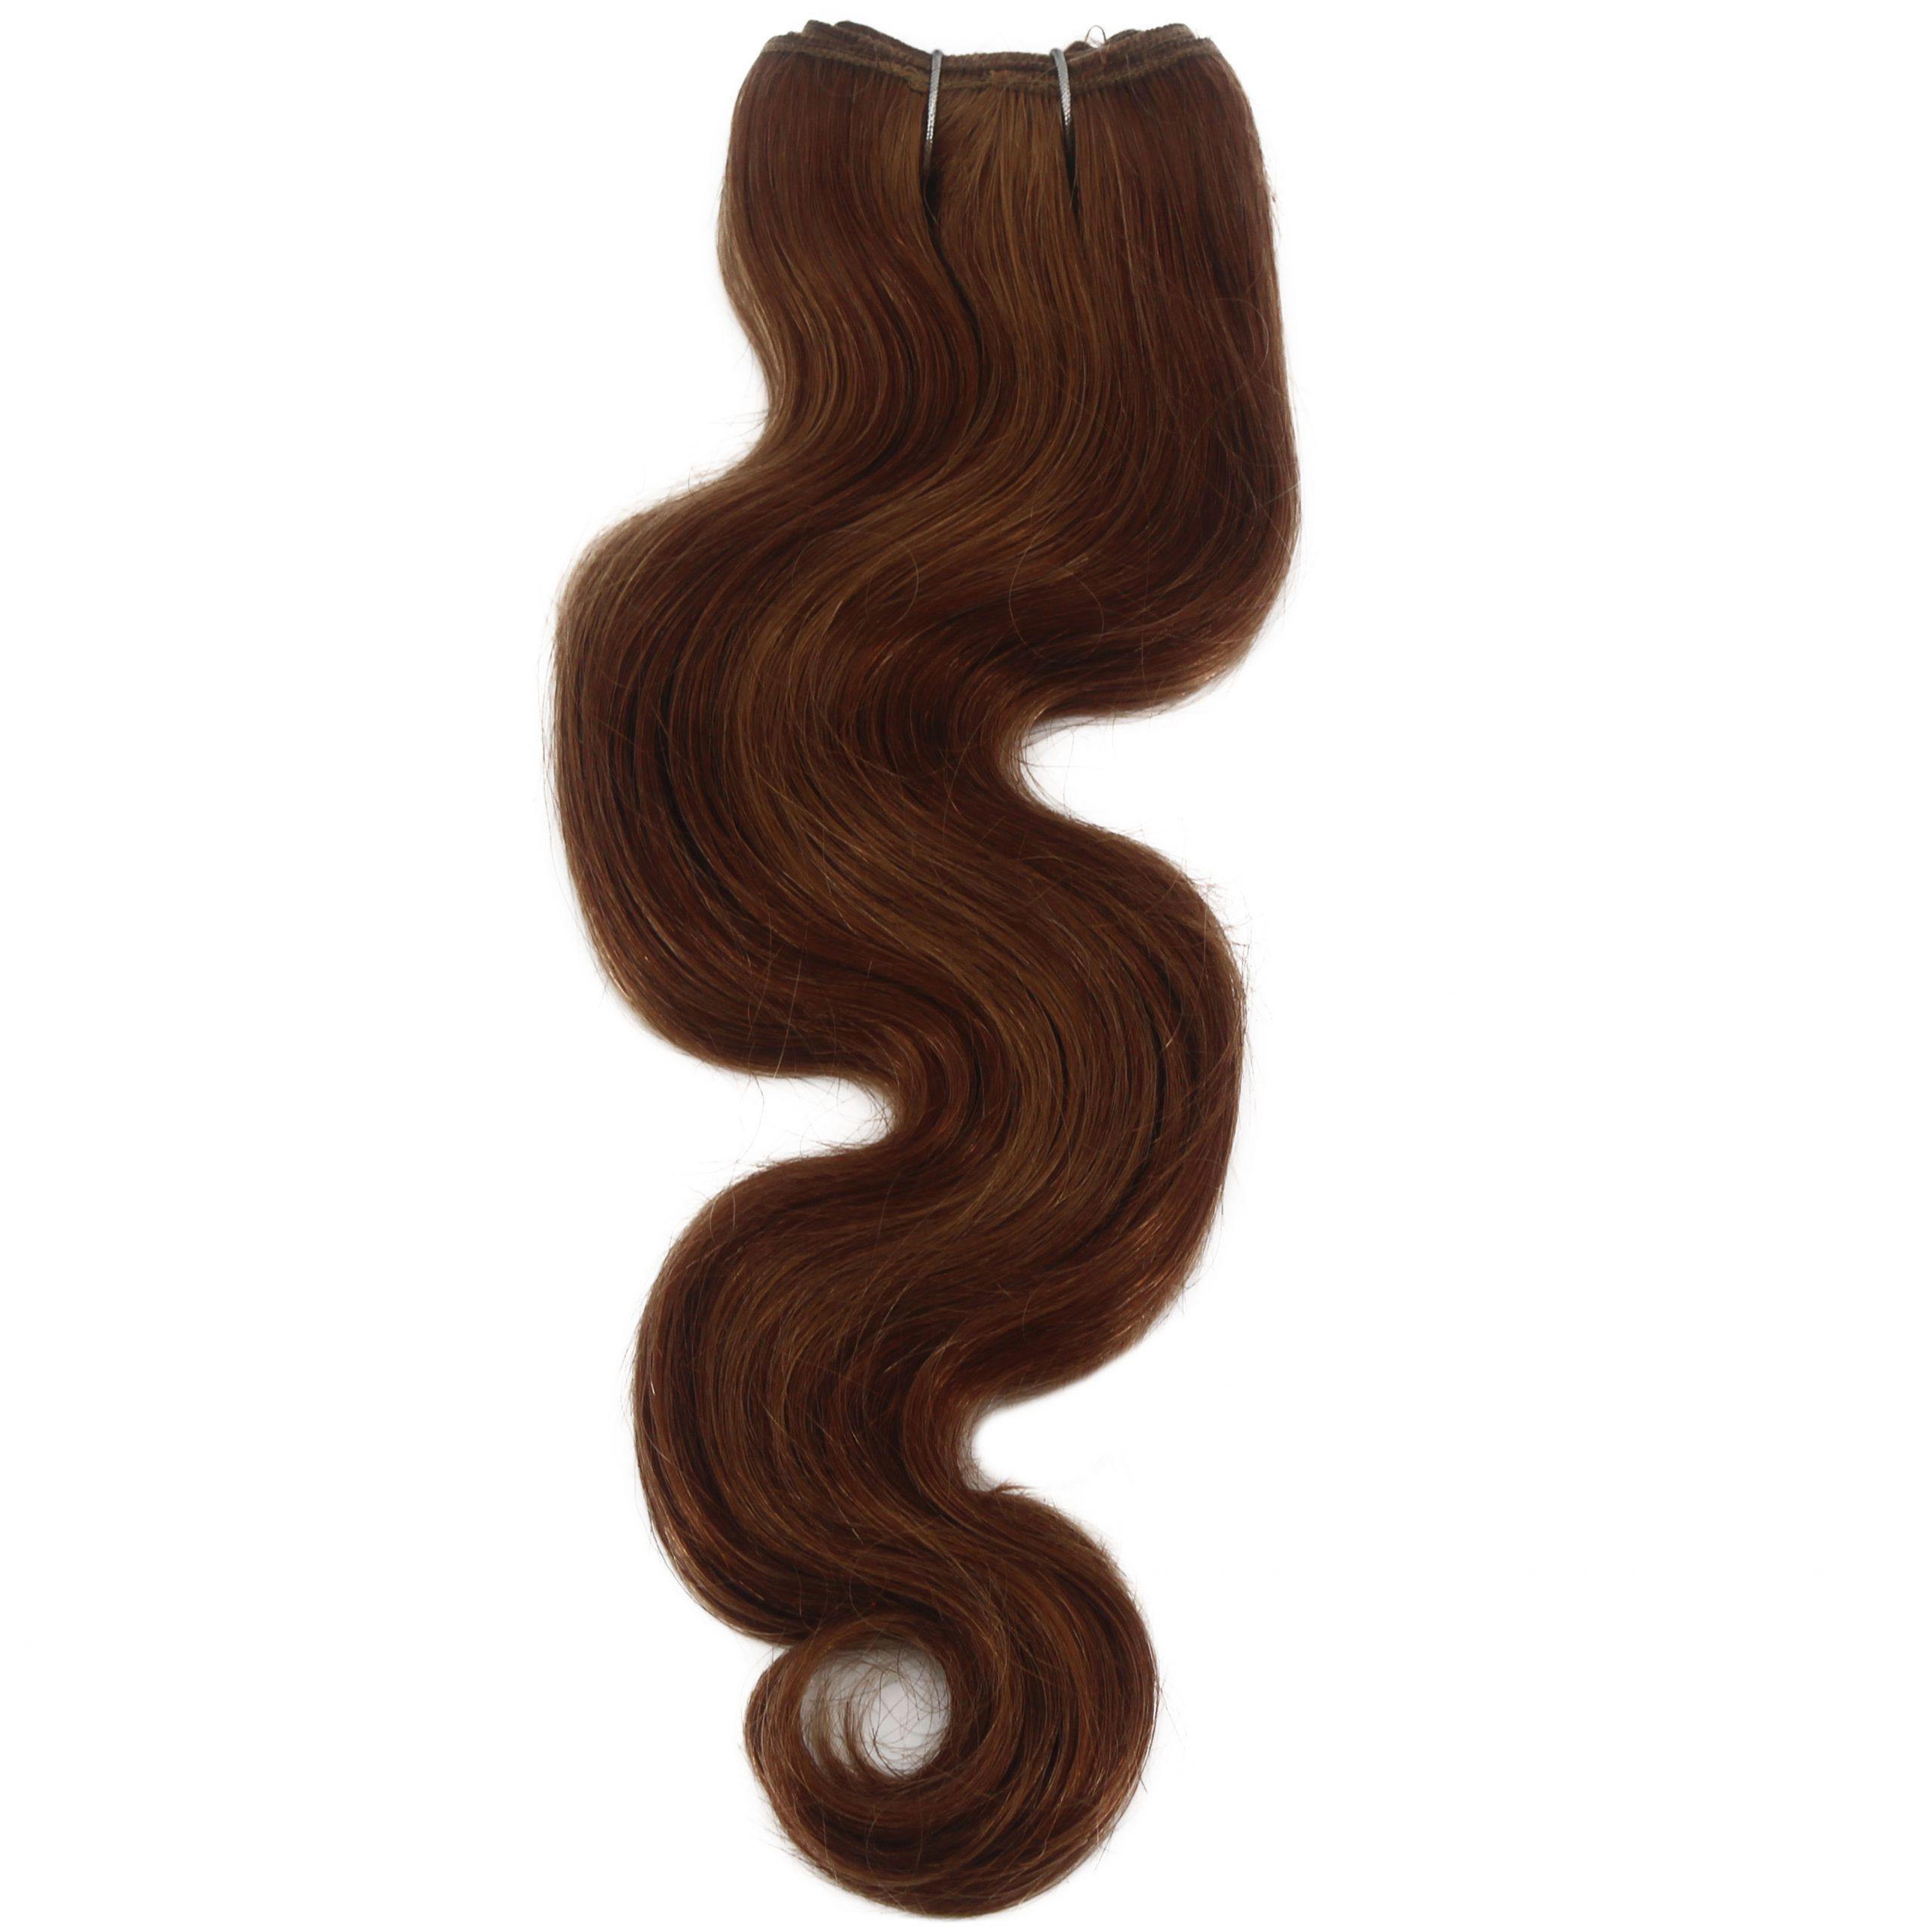 BODY WAVE 100% HUMAN HAIR 18 Inch - P27/30